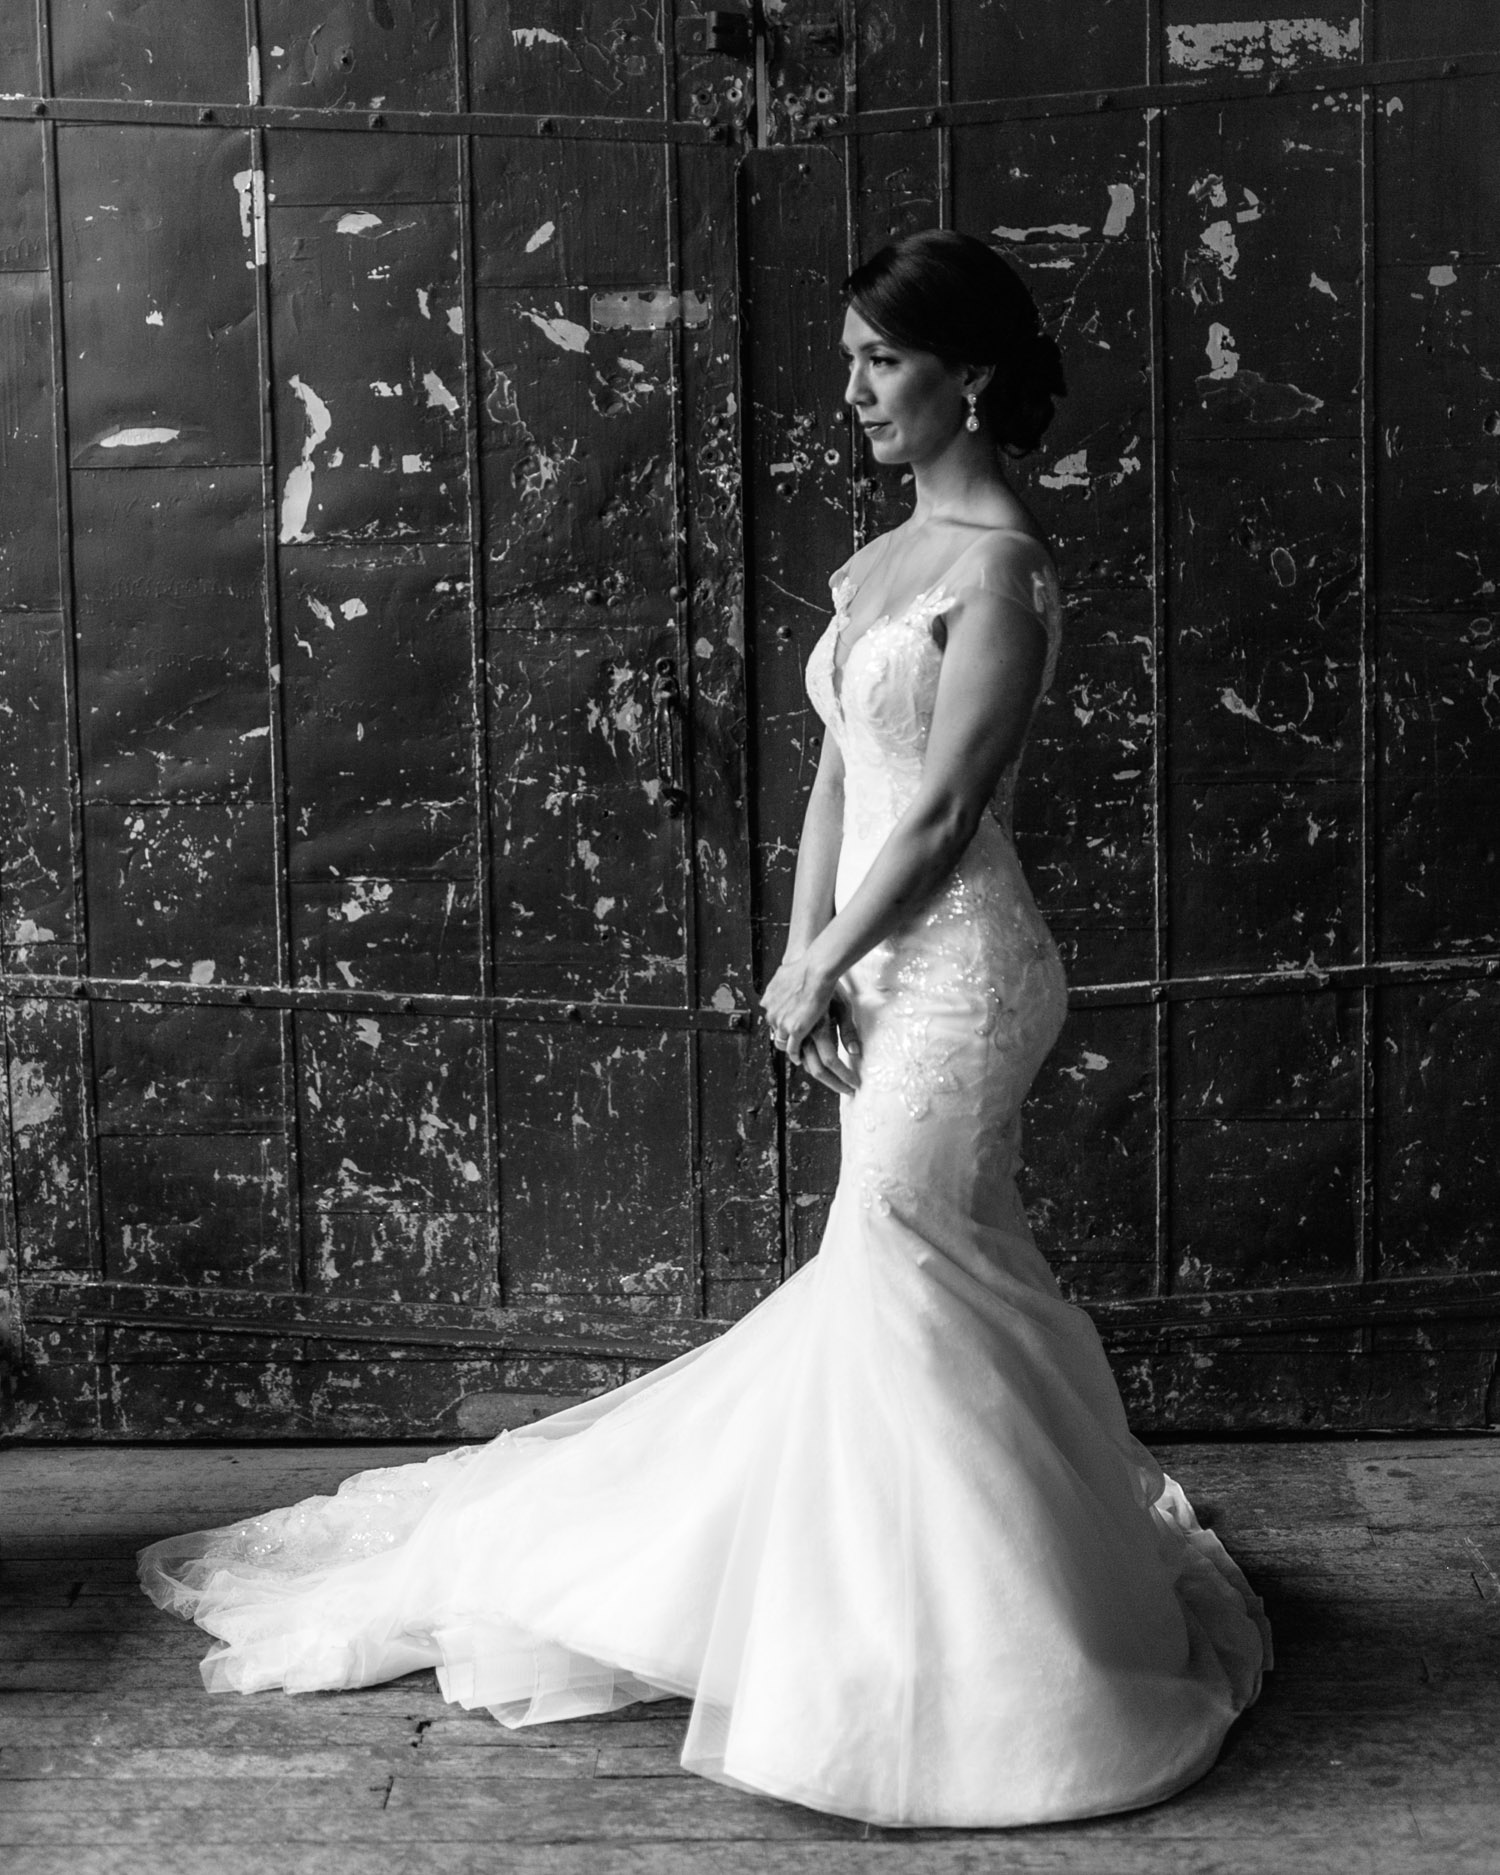 Metropolitan Building Wedding Queens, NY - Jessica & Tony x The Gathering Season 023.jpg